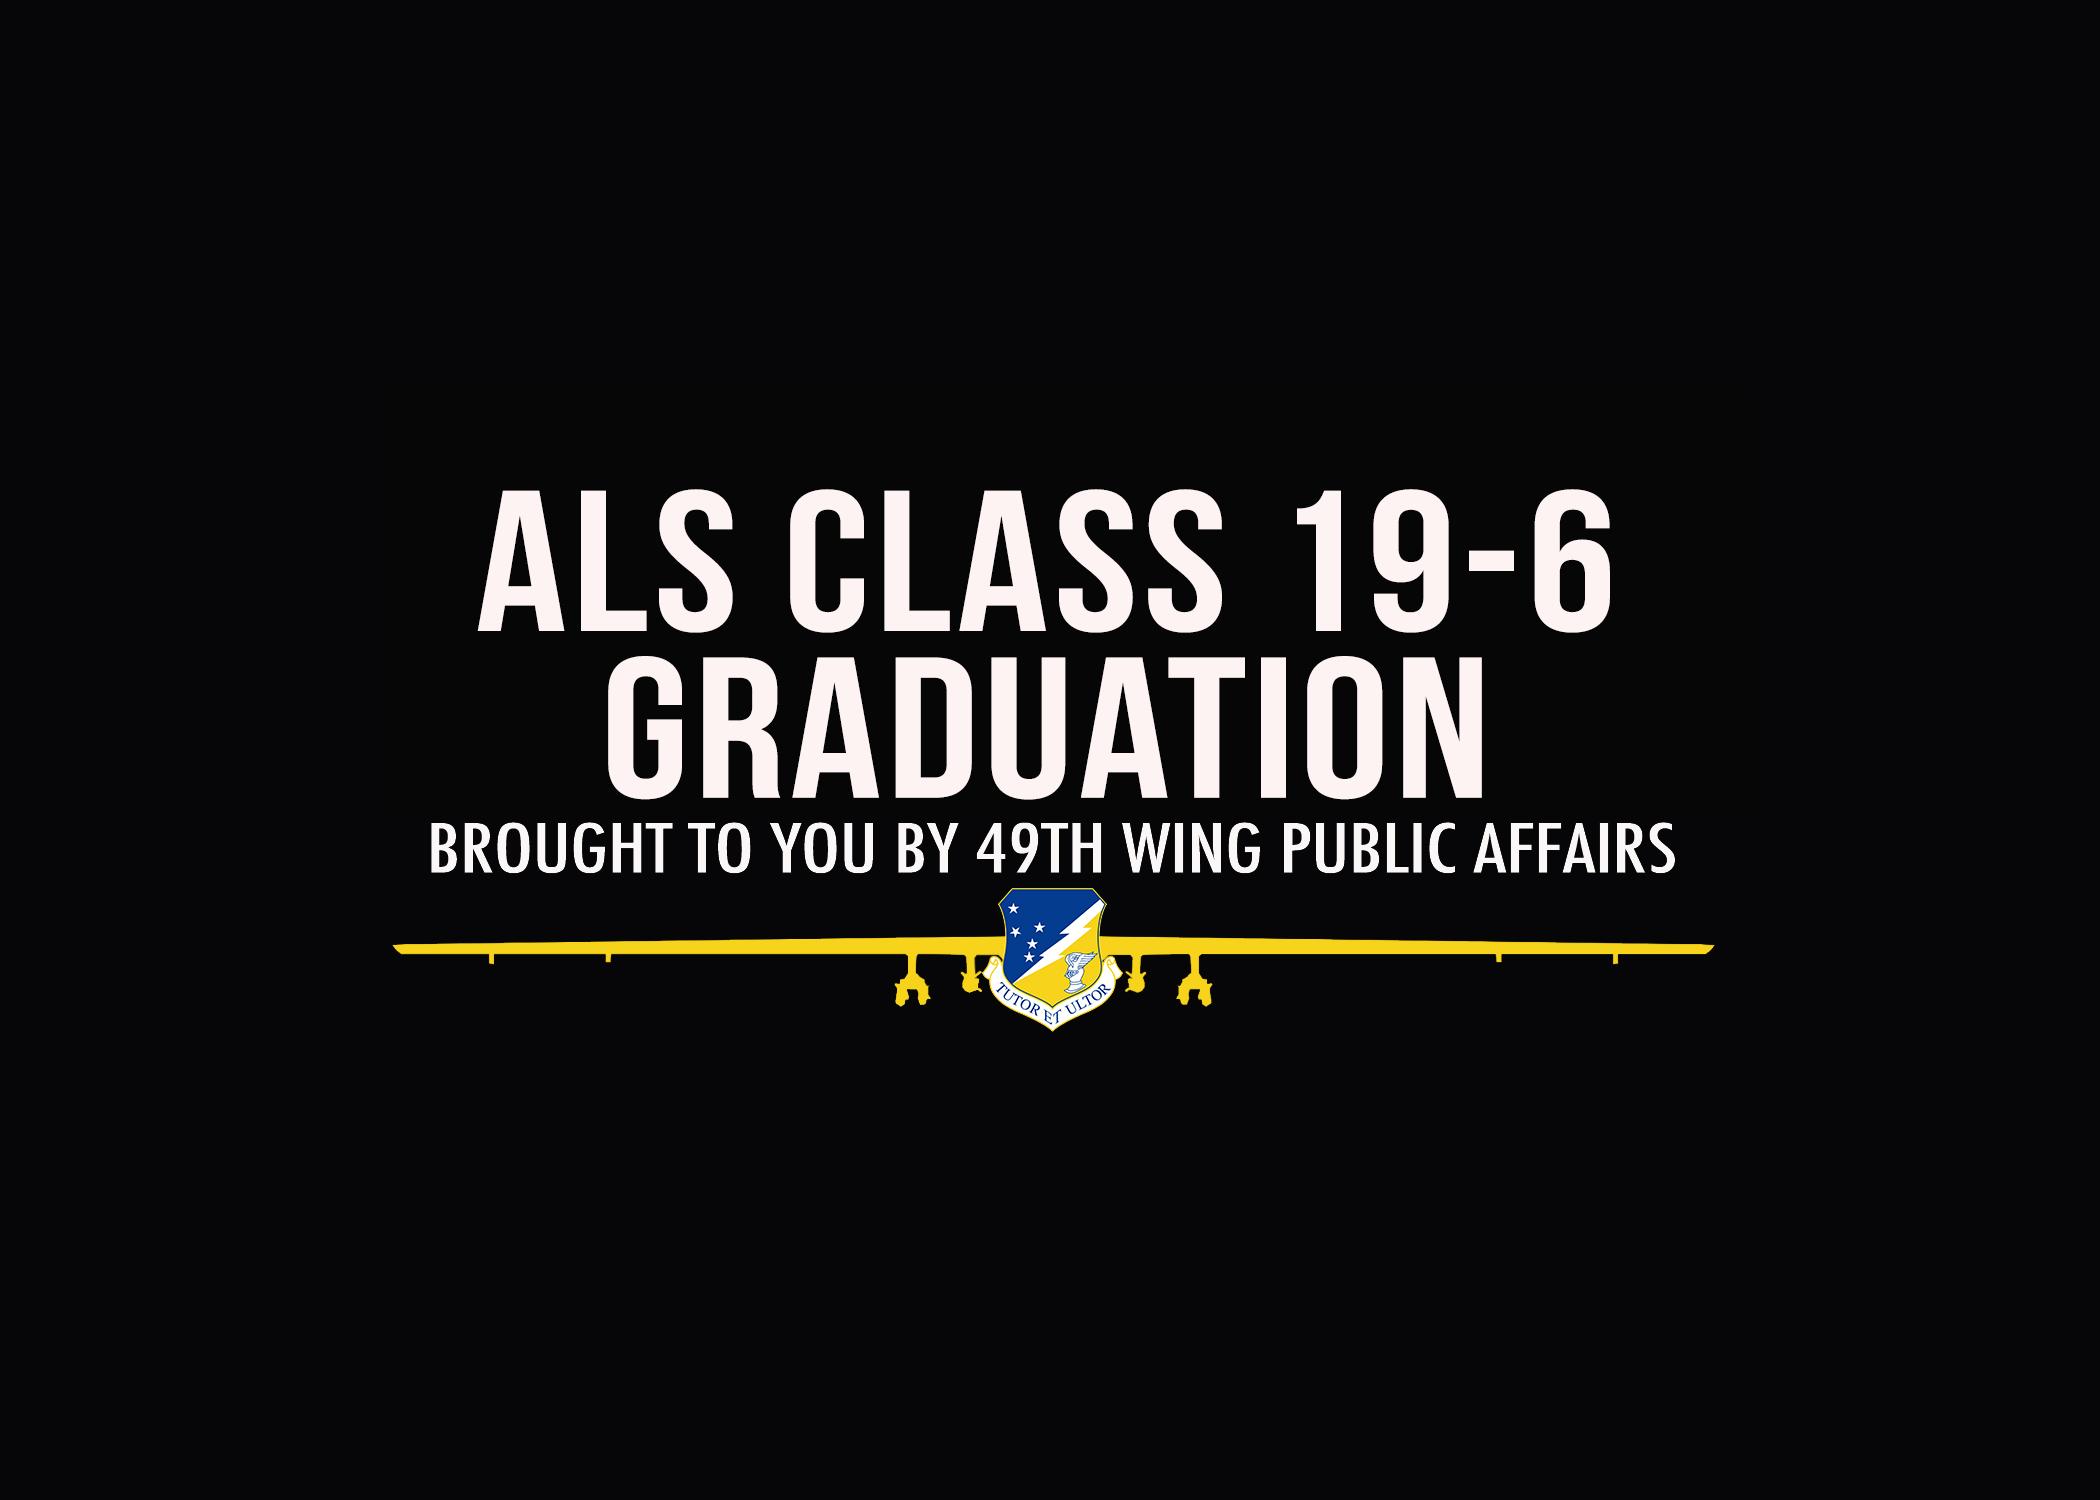 ALS Class 19-6